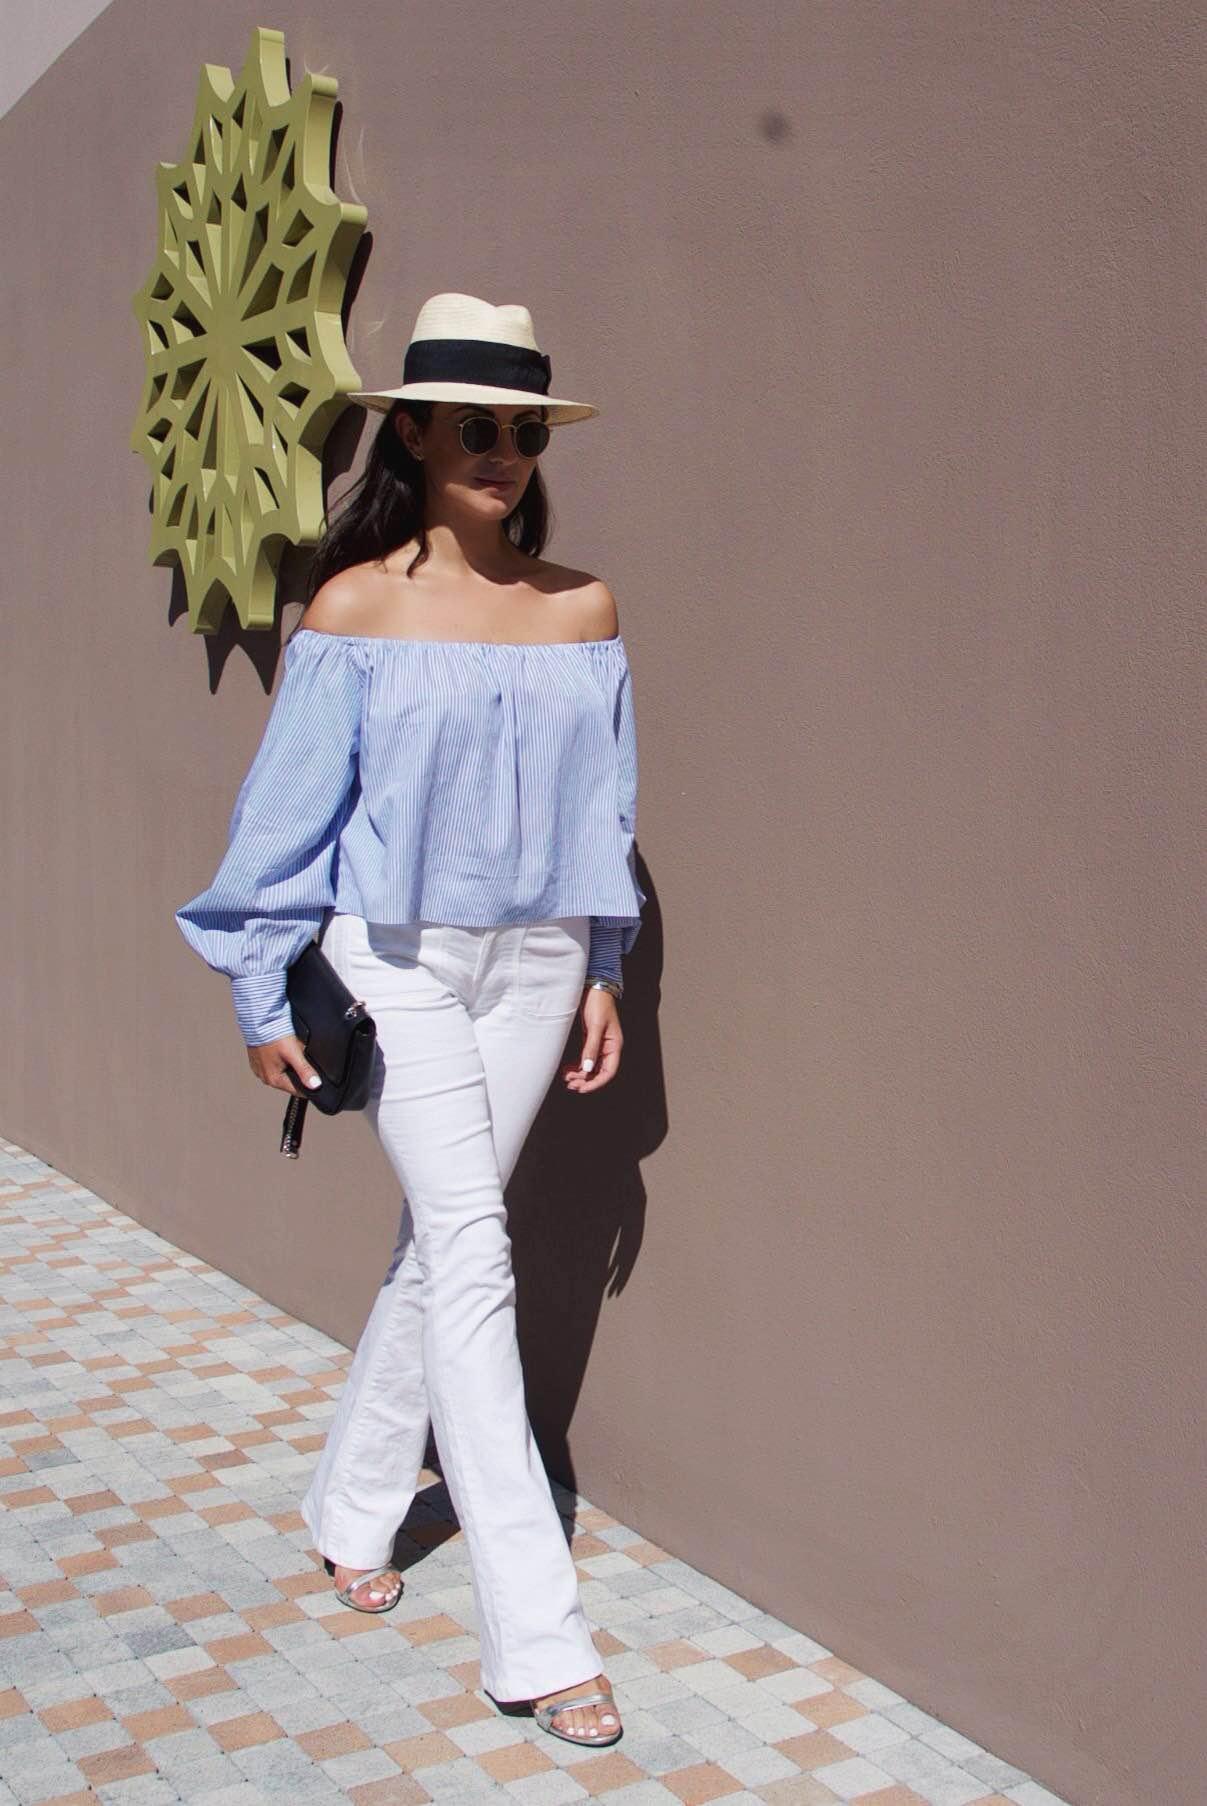 06-Tiara-Miramar-Beach-Hotel-Spa-Cote-dAzur-Yllka-Brada-Collaboration-Disi-Couture